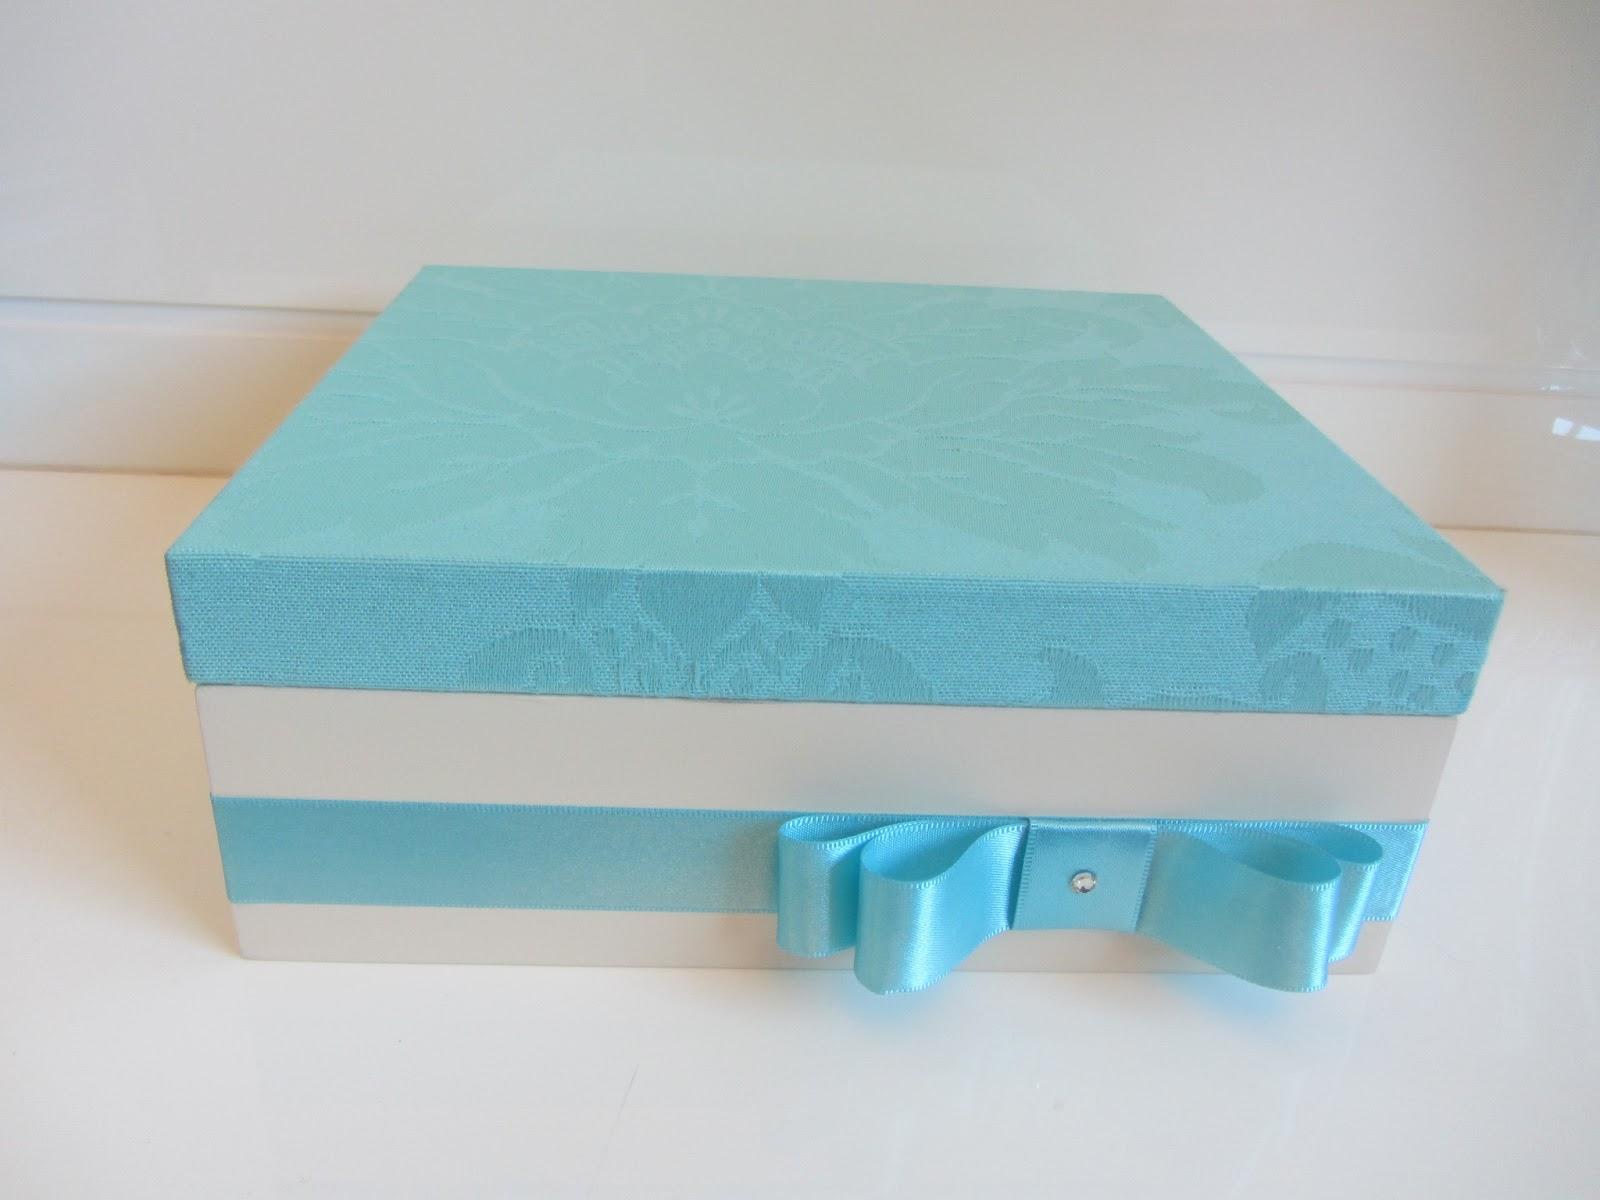 Azul Tiffany Aromatizador 60 Ml Pictures #1F88AC 1600 1200